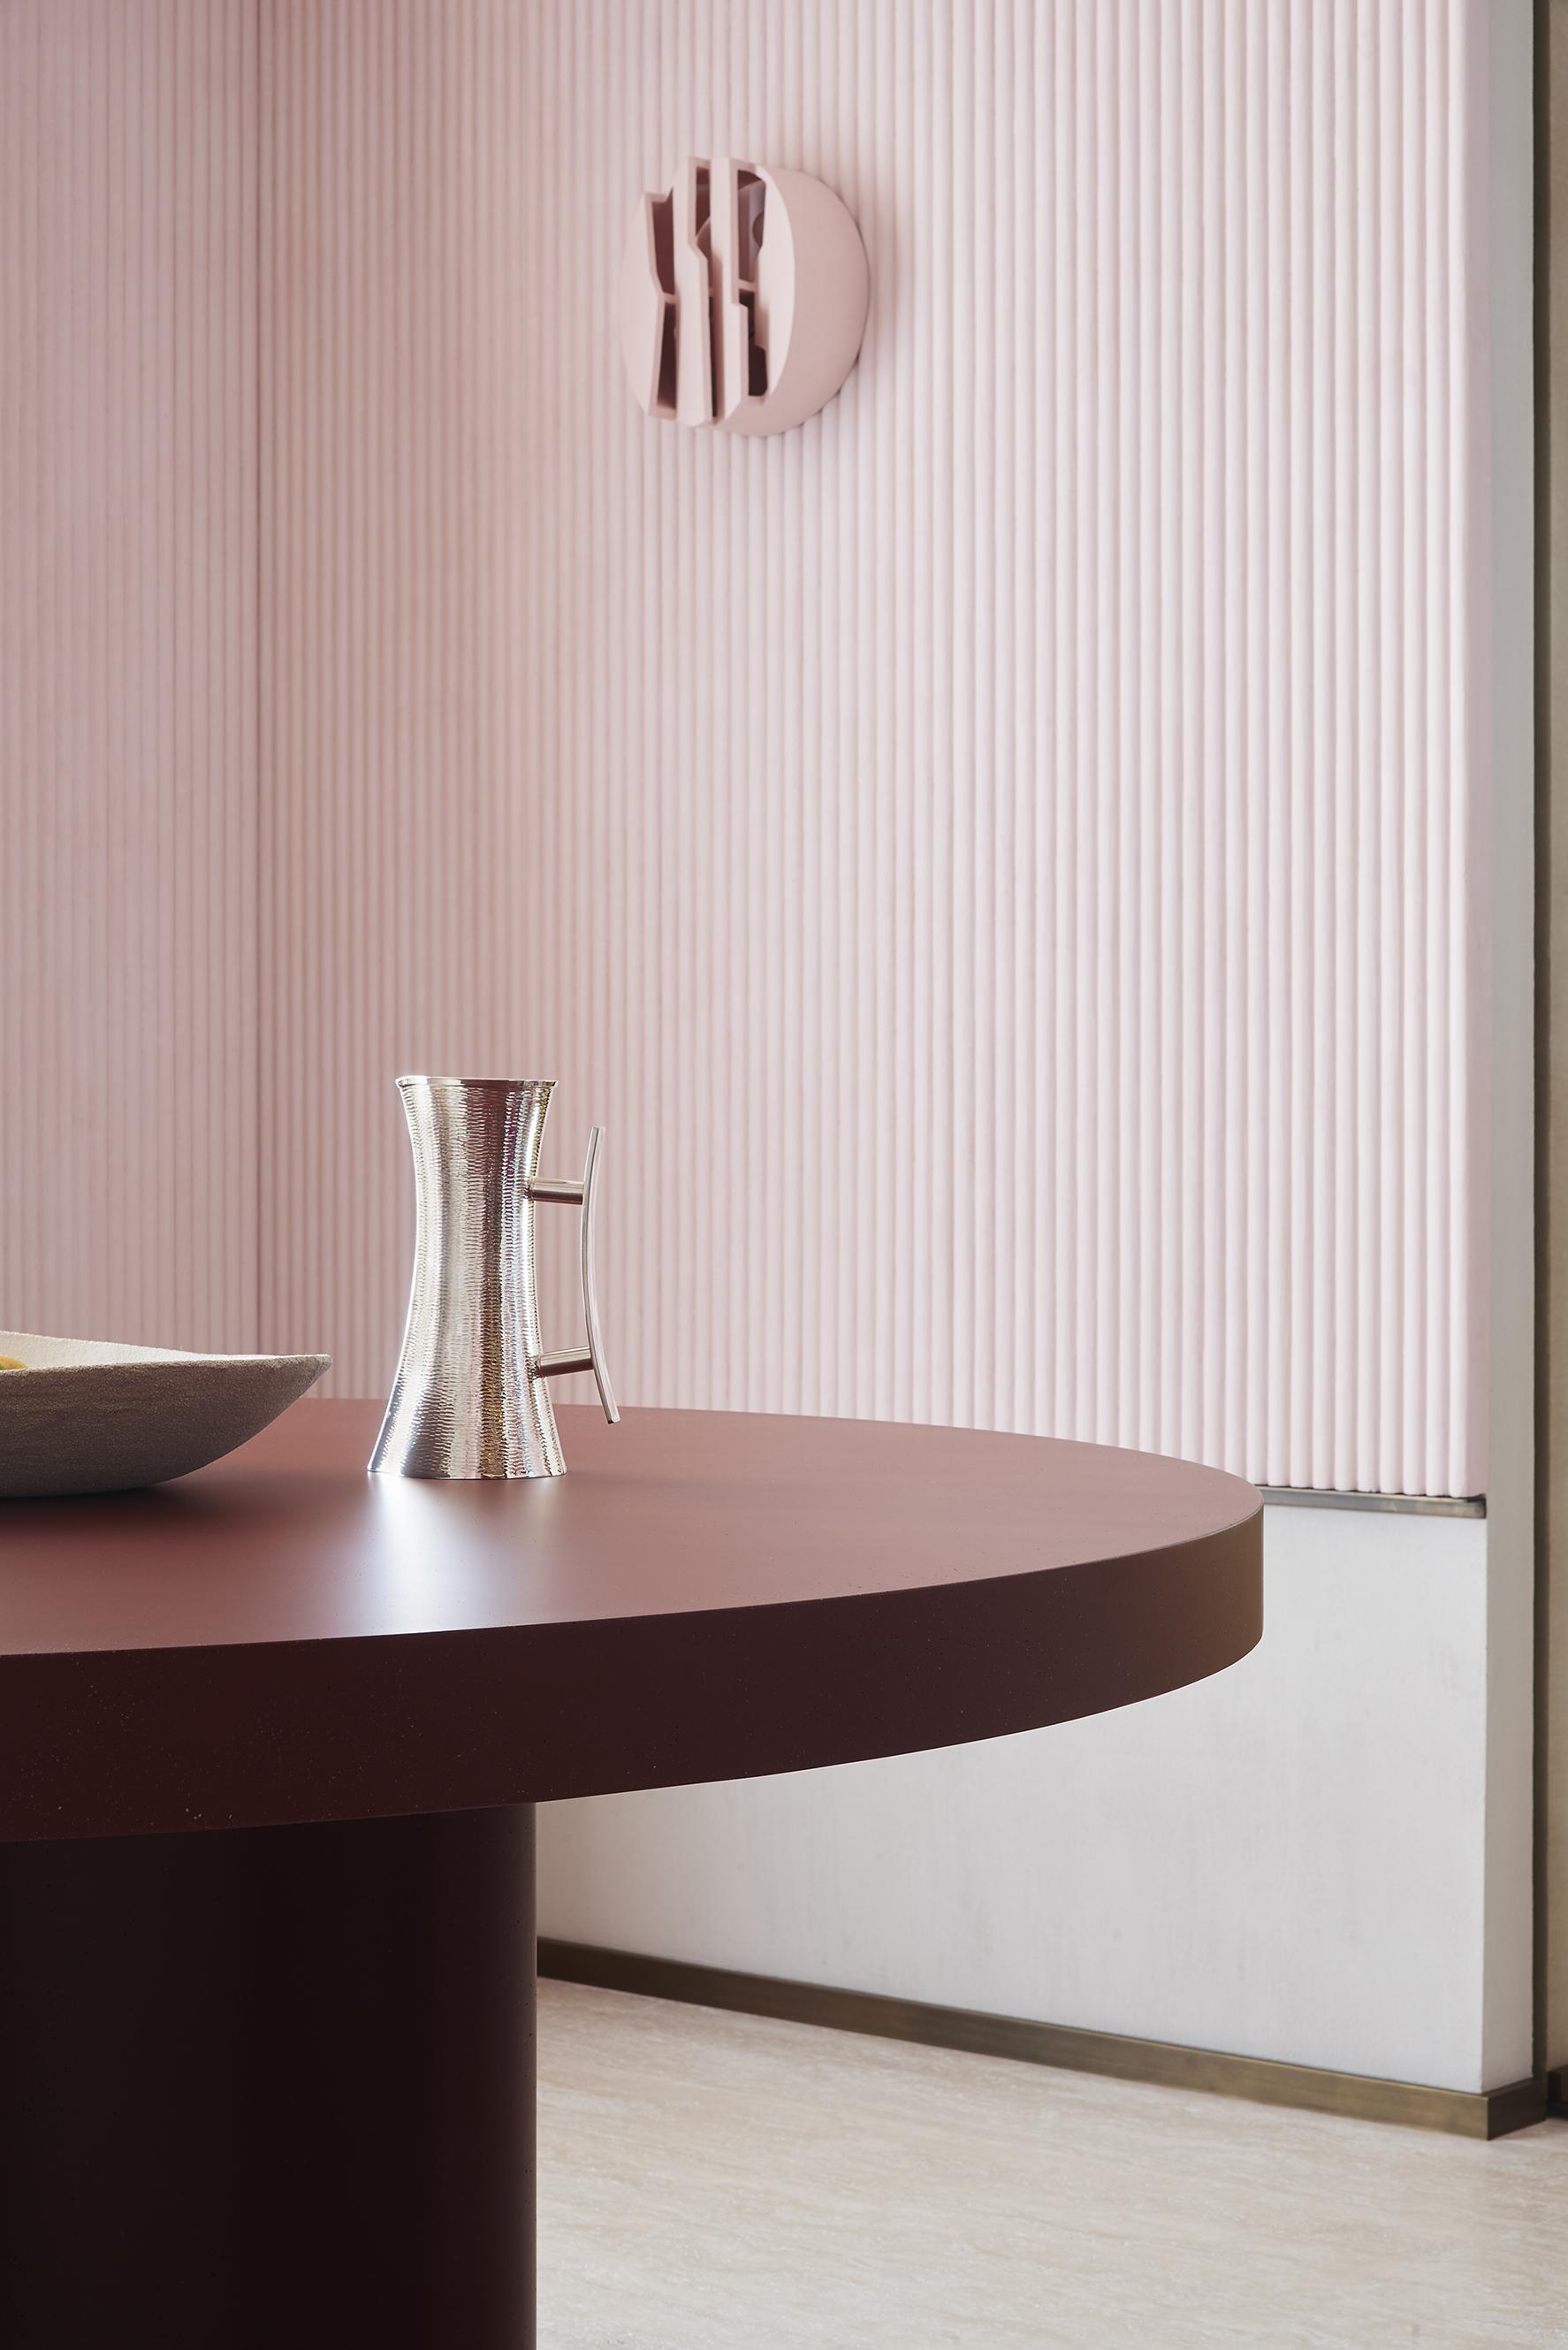 003-Rodolphe_Parente_Appartement_Sud